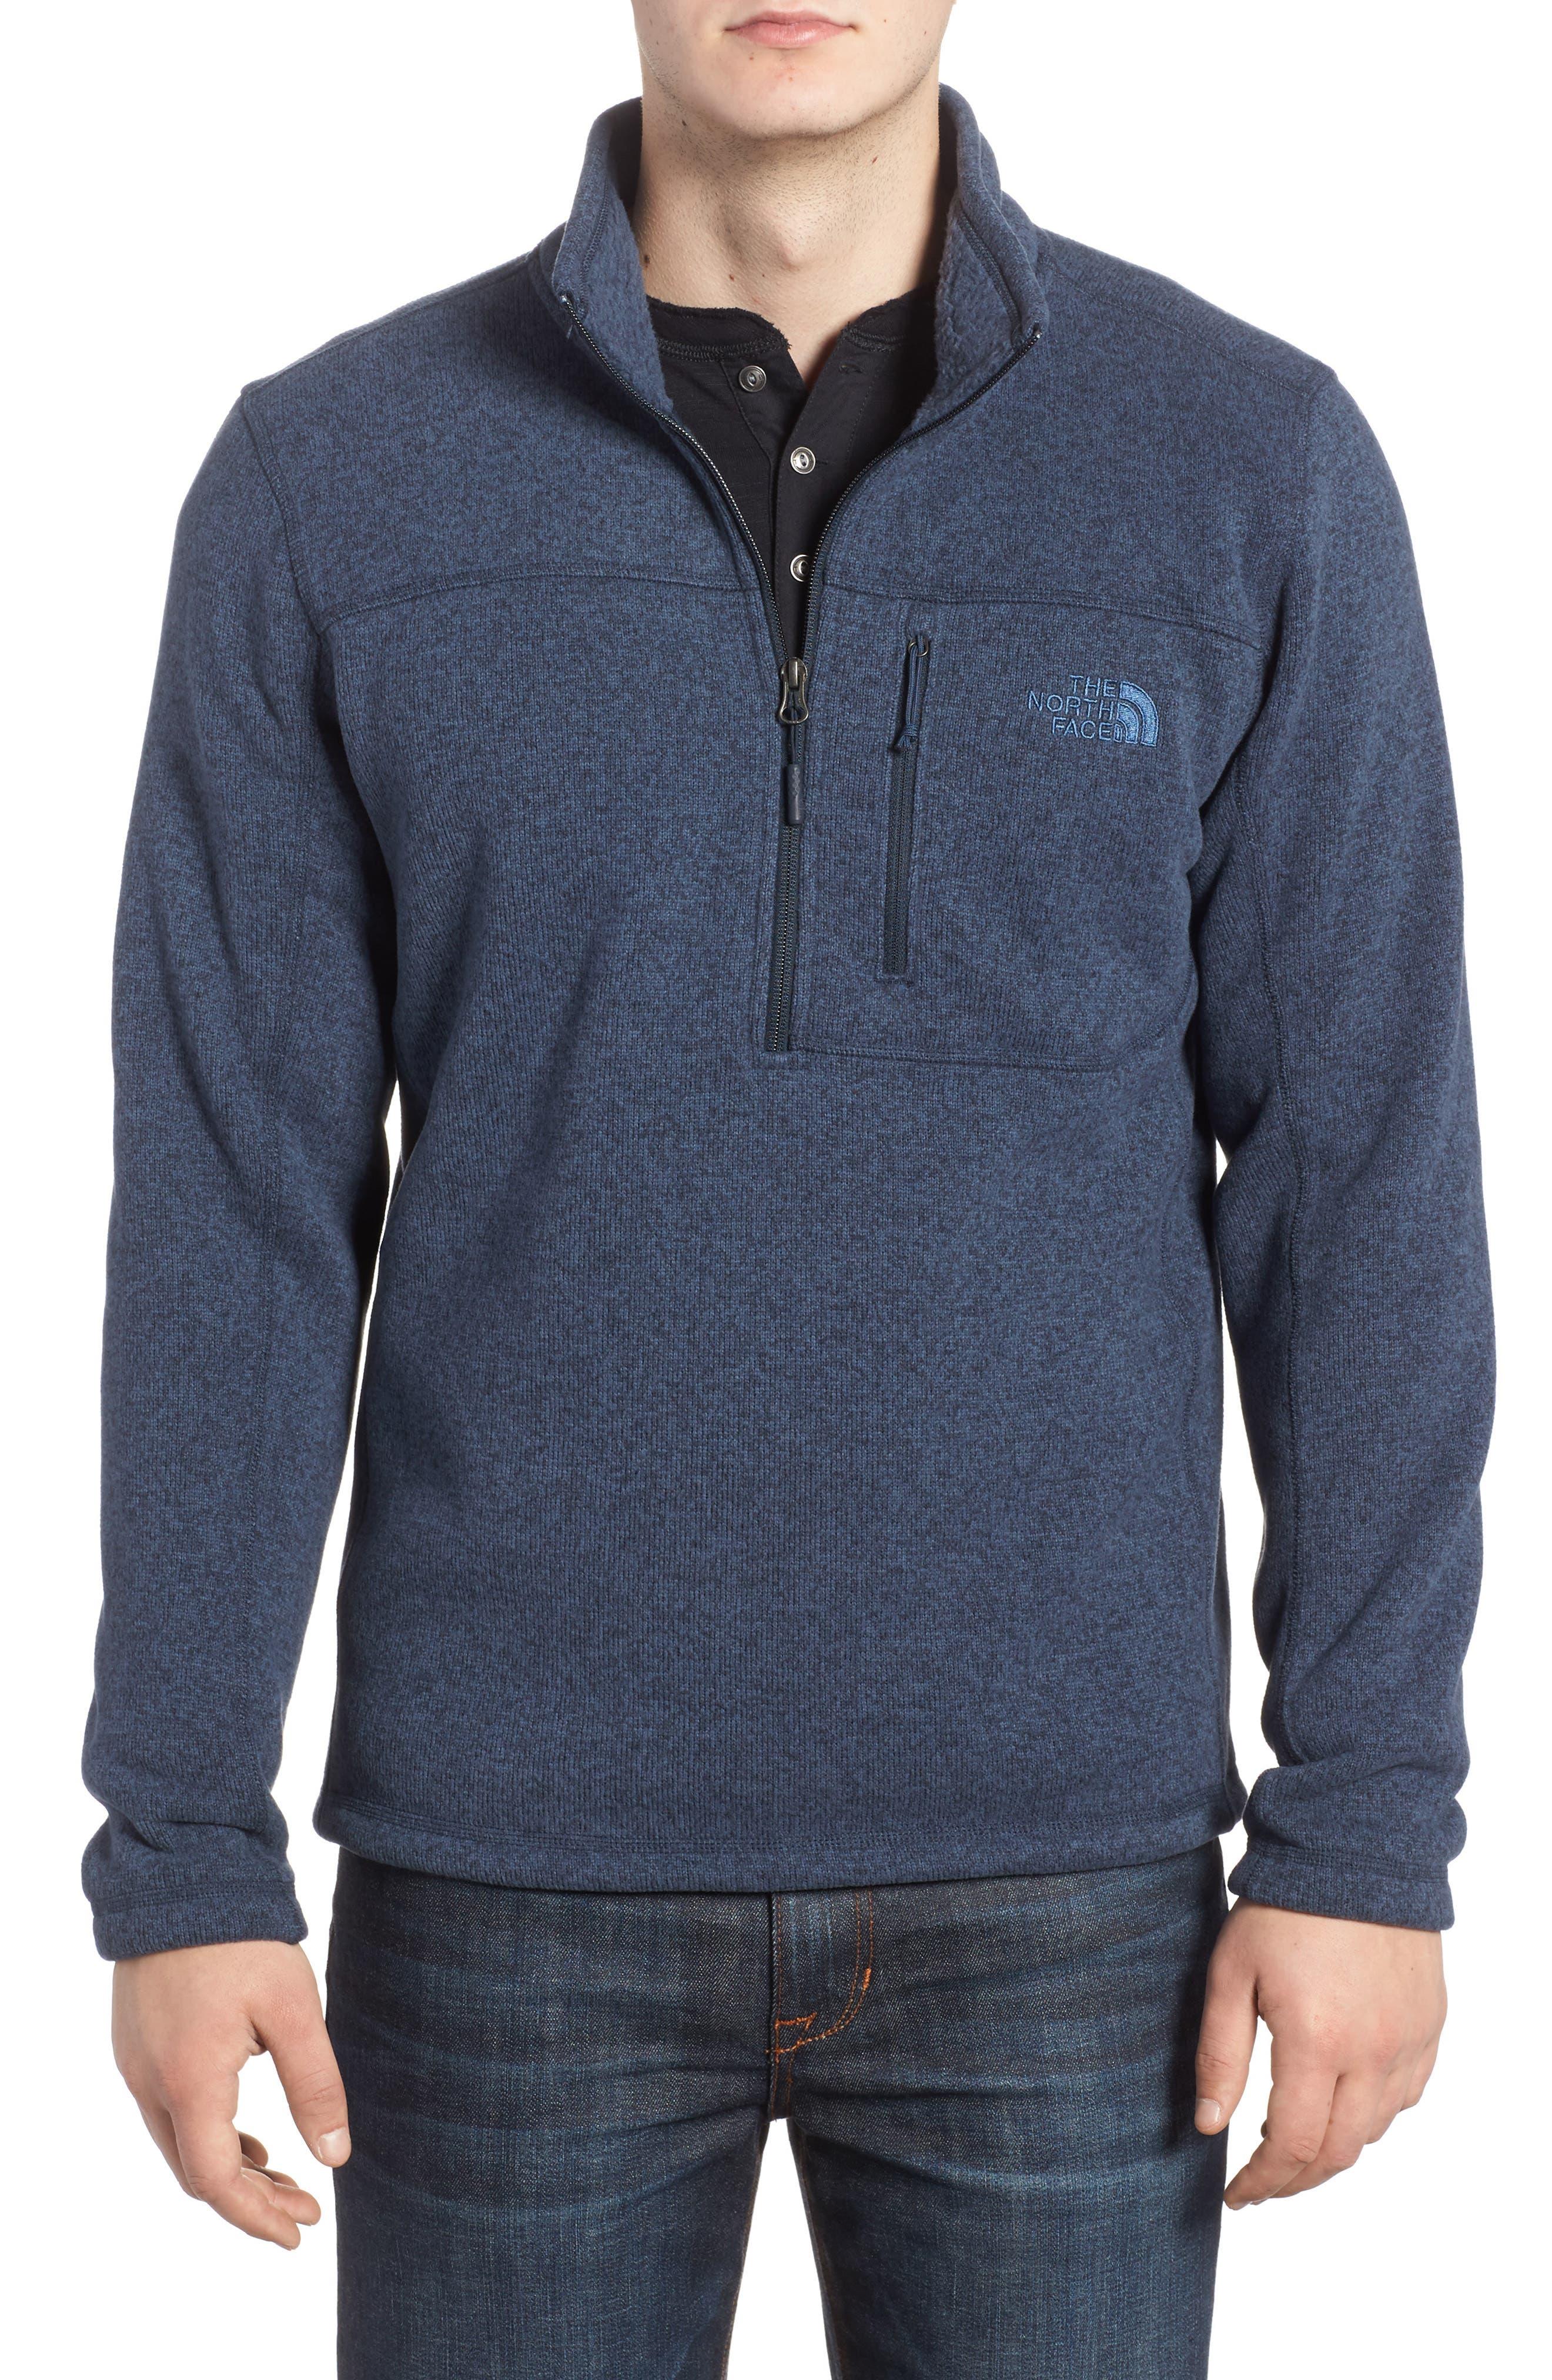 Gordon Lyons Quarter-Zip Fleece Jacket,                         Main,                         color, URBAN NAVY HEATHER